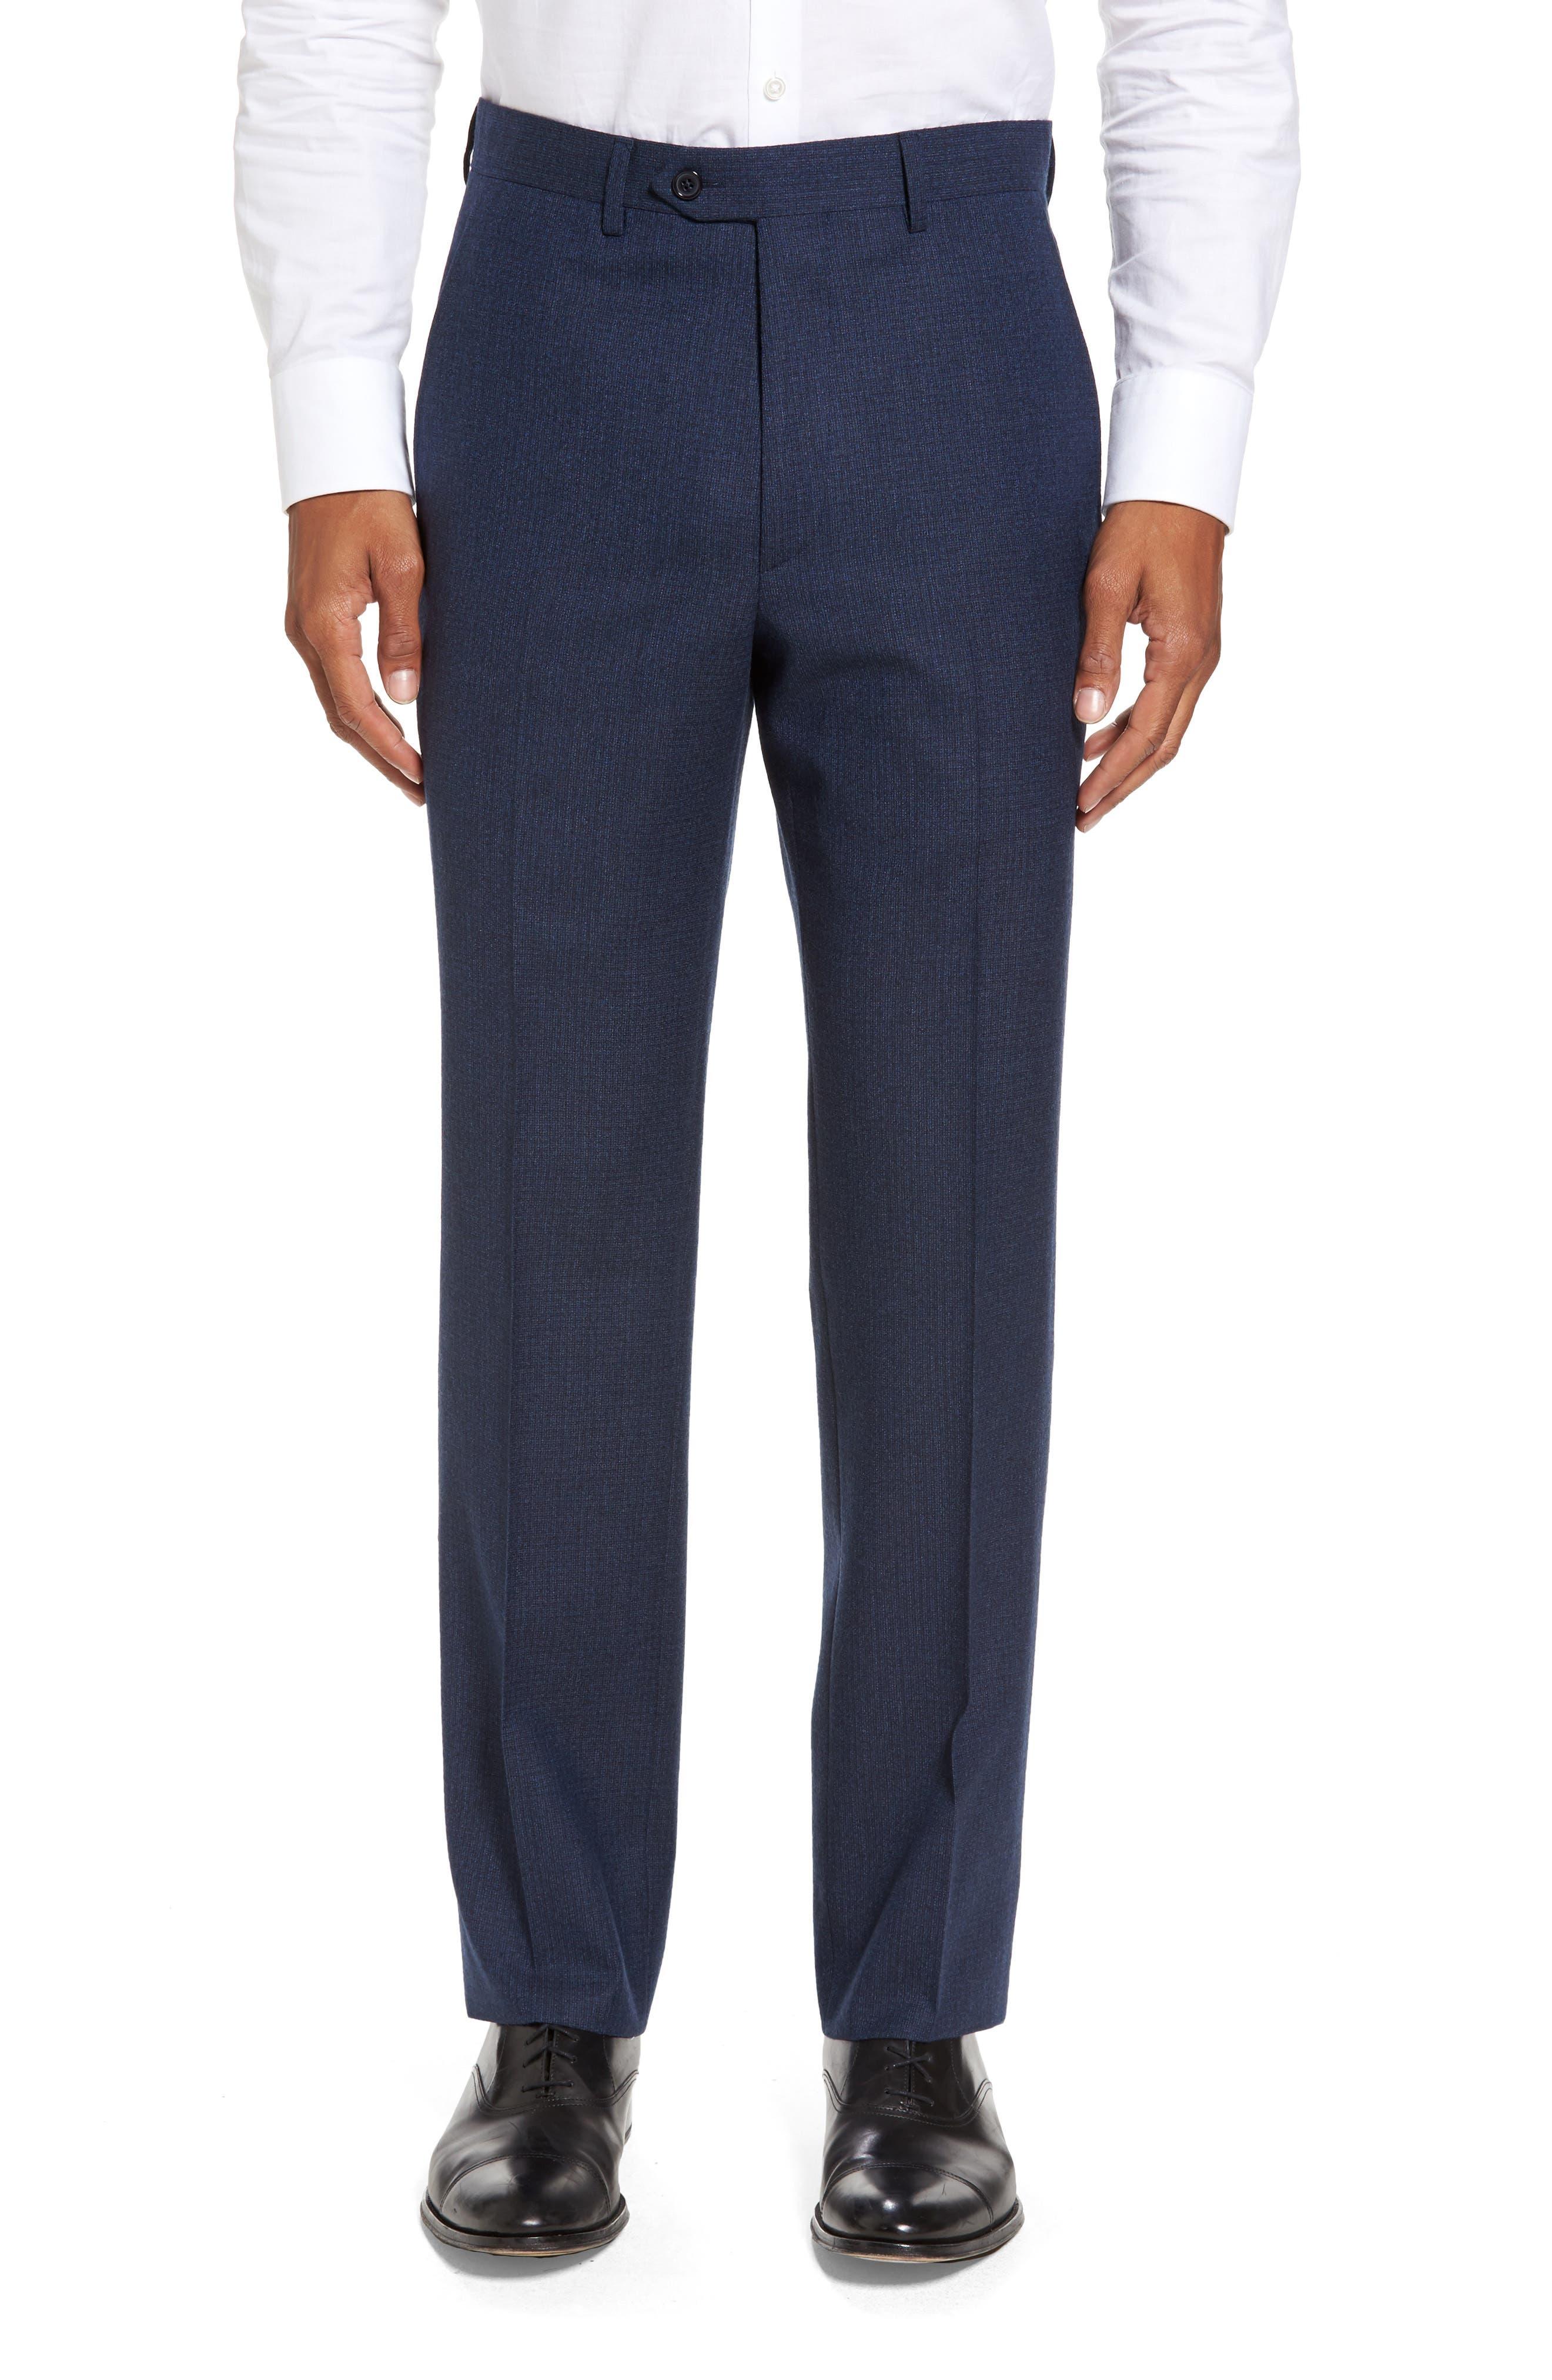 Alternate Image 1 Selected - Santorelli Romero Regular Fit Flat Front Trousers